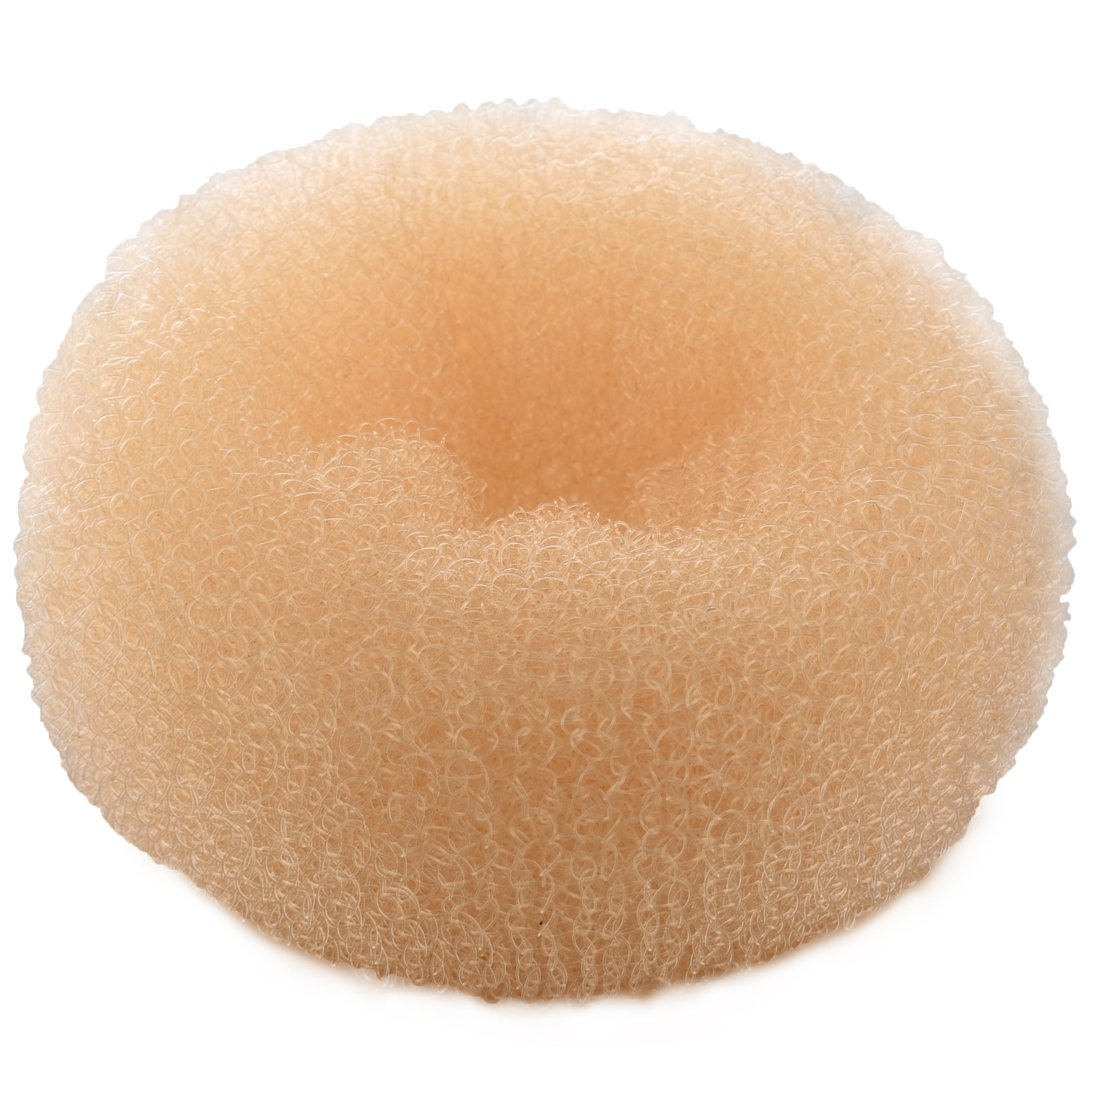 TOOGOO(R) Blonde Donut Hair Ring Bun Former Shaper Styler Tool